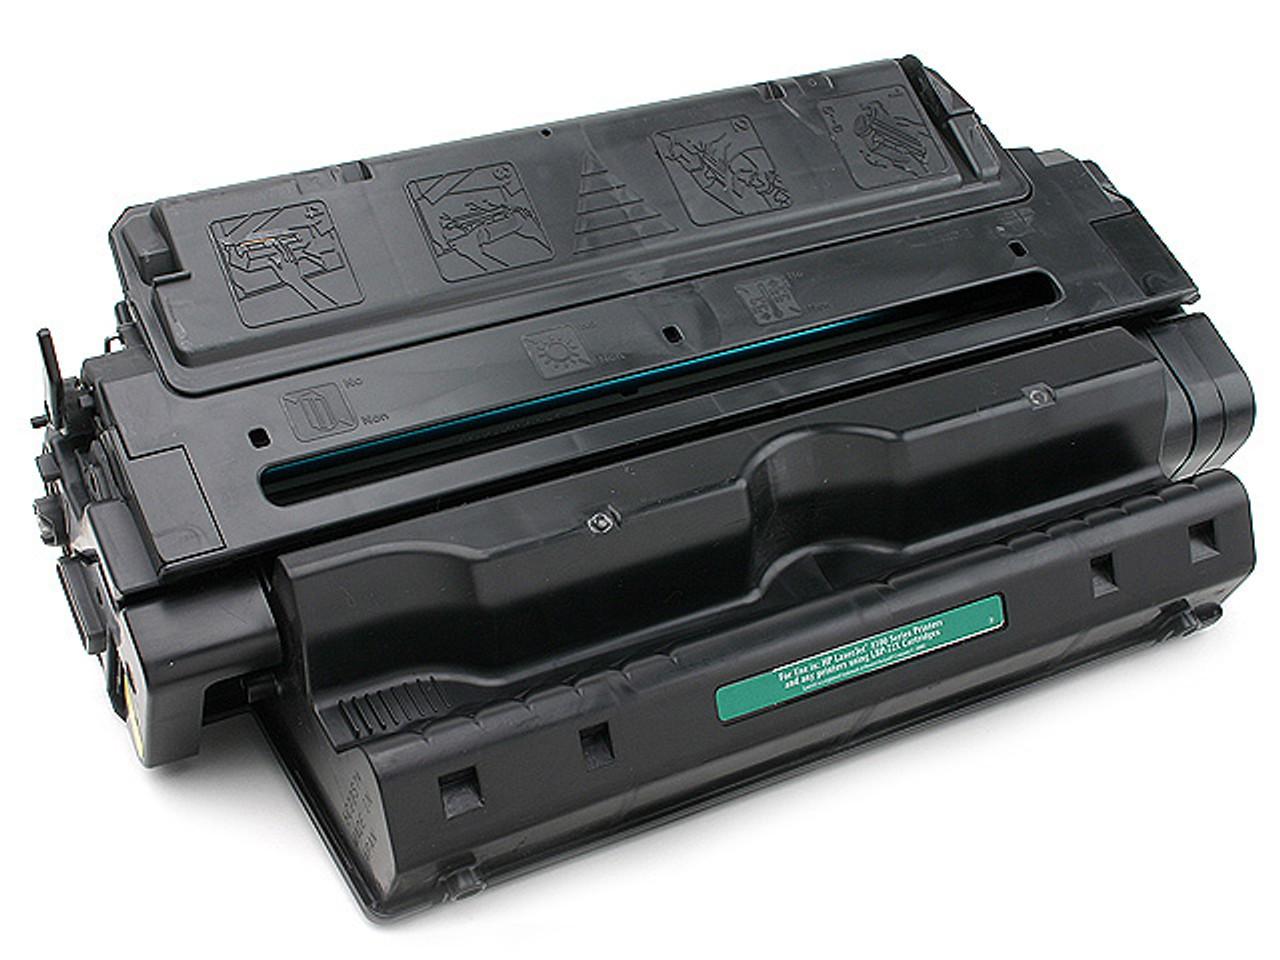 HP 8100 8150 Toner Cartridge - New compatible